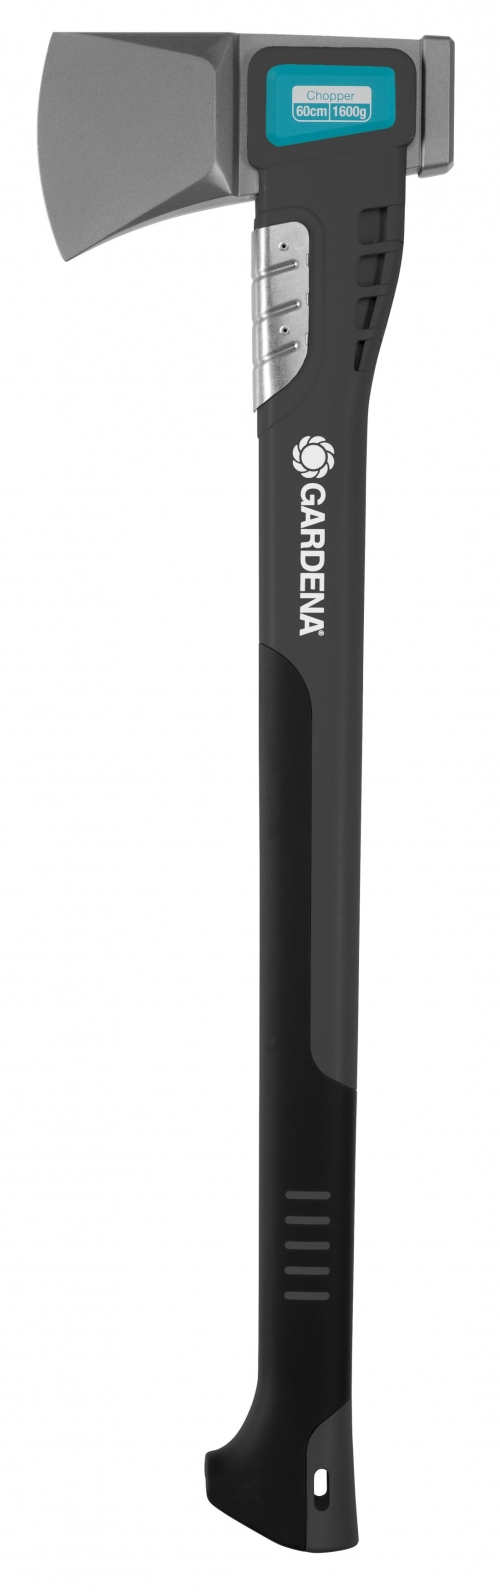 GARDENA Fejsze 1600 S (Fekete)